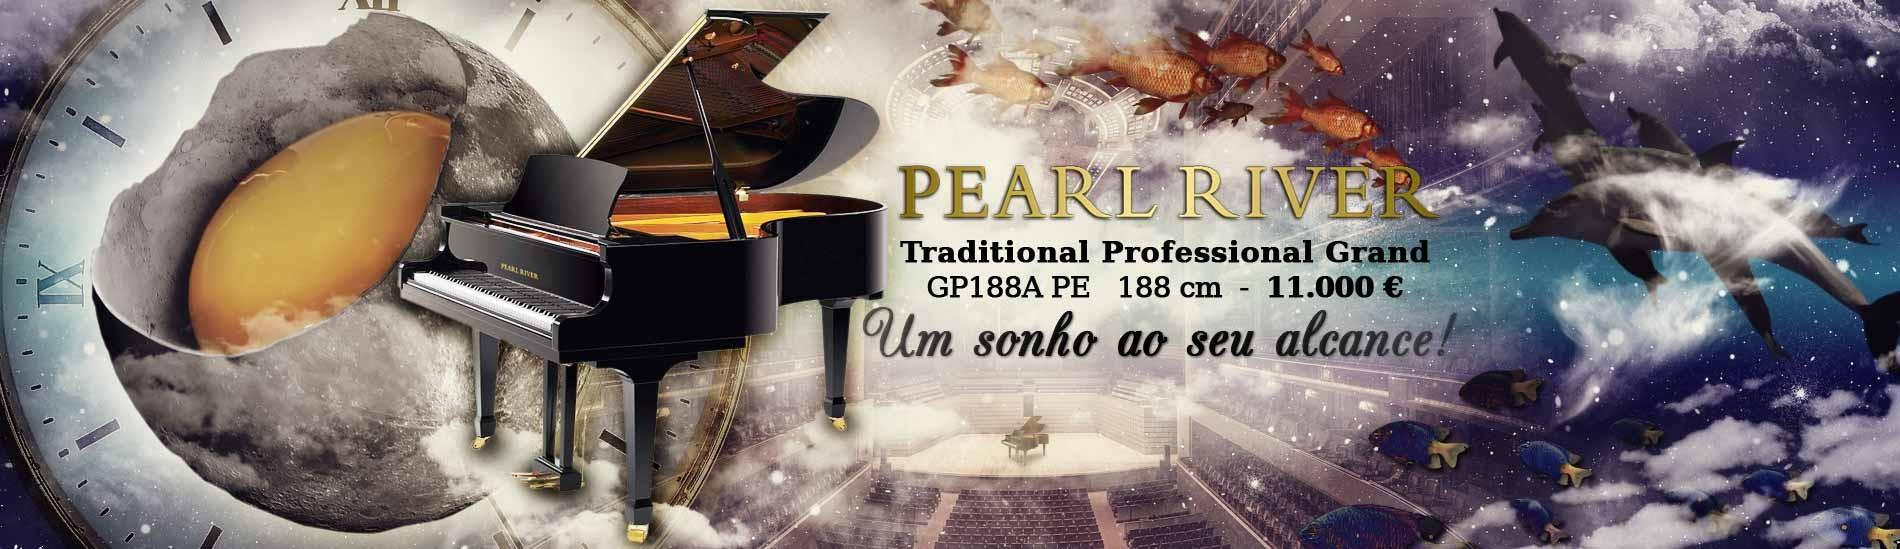 Piano de Cauda Pearl River GP188A PE Traditional Professional Grand 188 cm